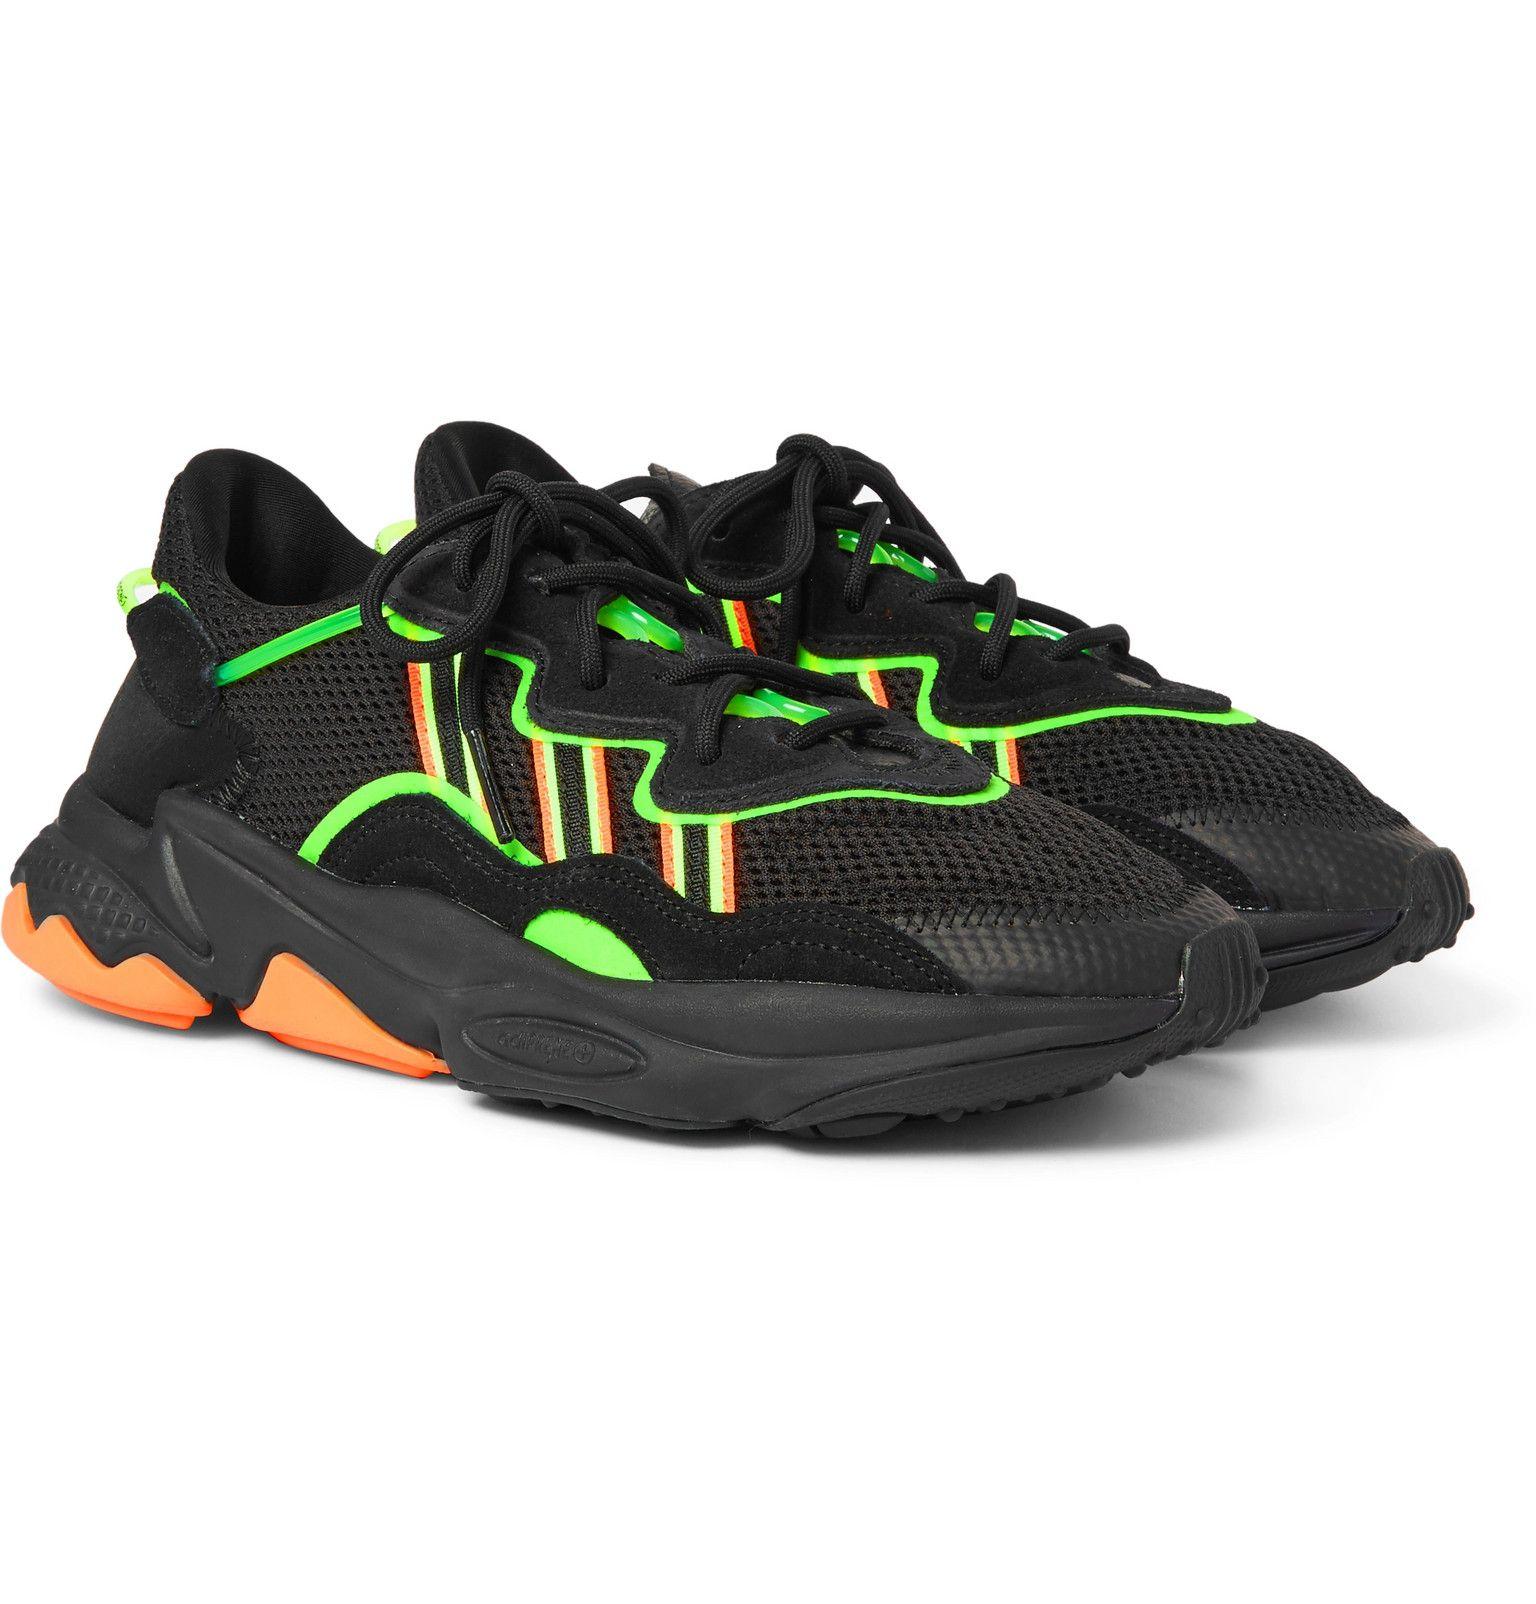 Ozweego Mesh and Suede Sneakers | Sneakers, Suede sneakers ...